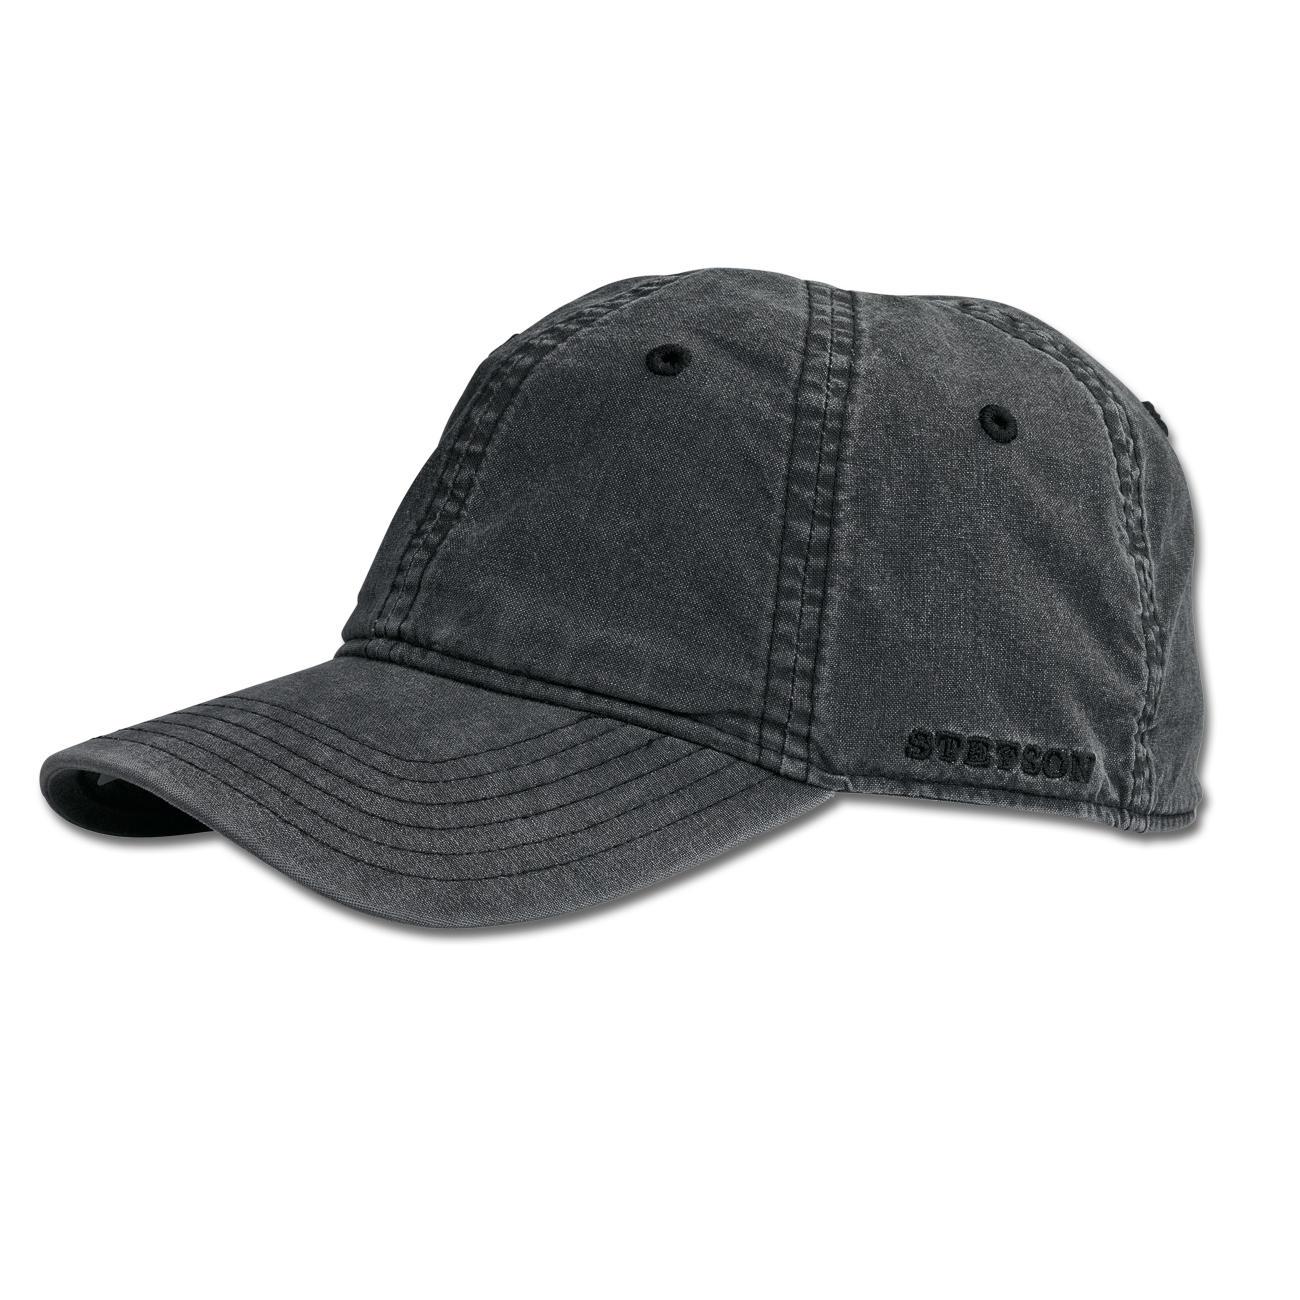 b633342f7a1 Stetson Baseball Cap